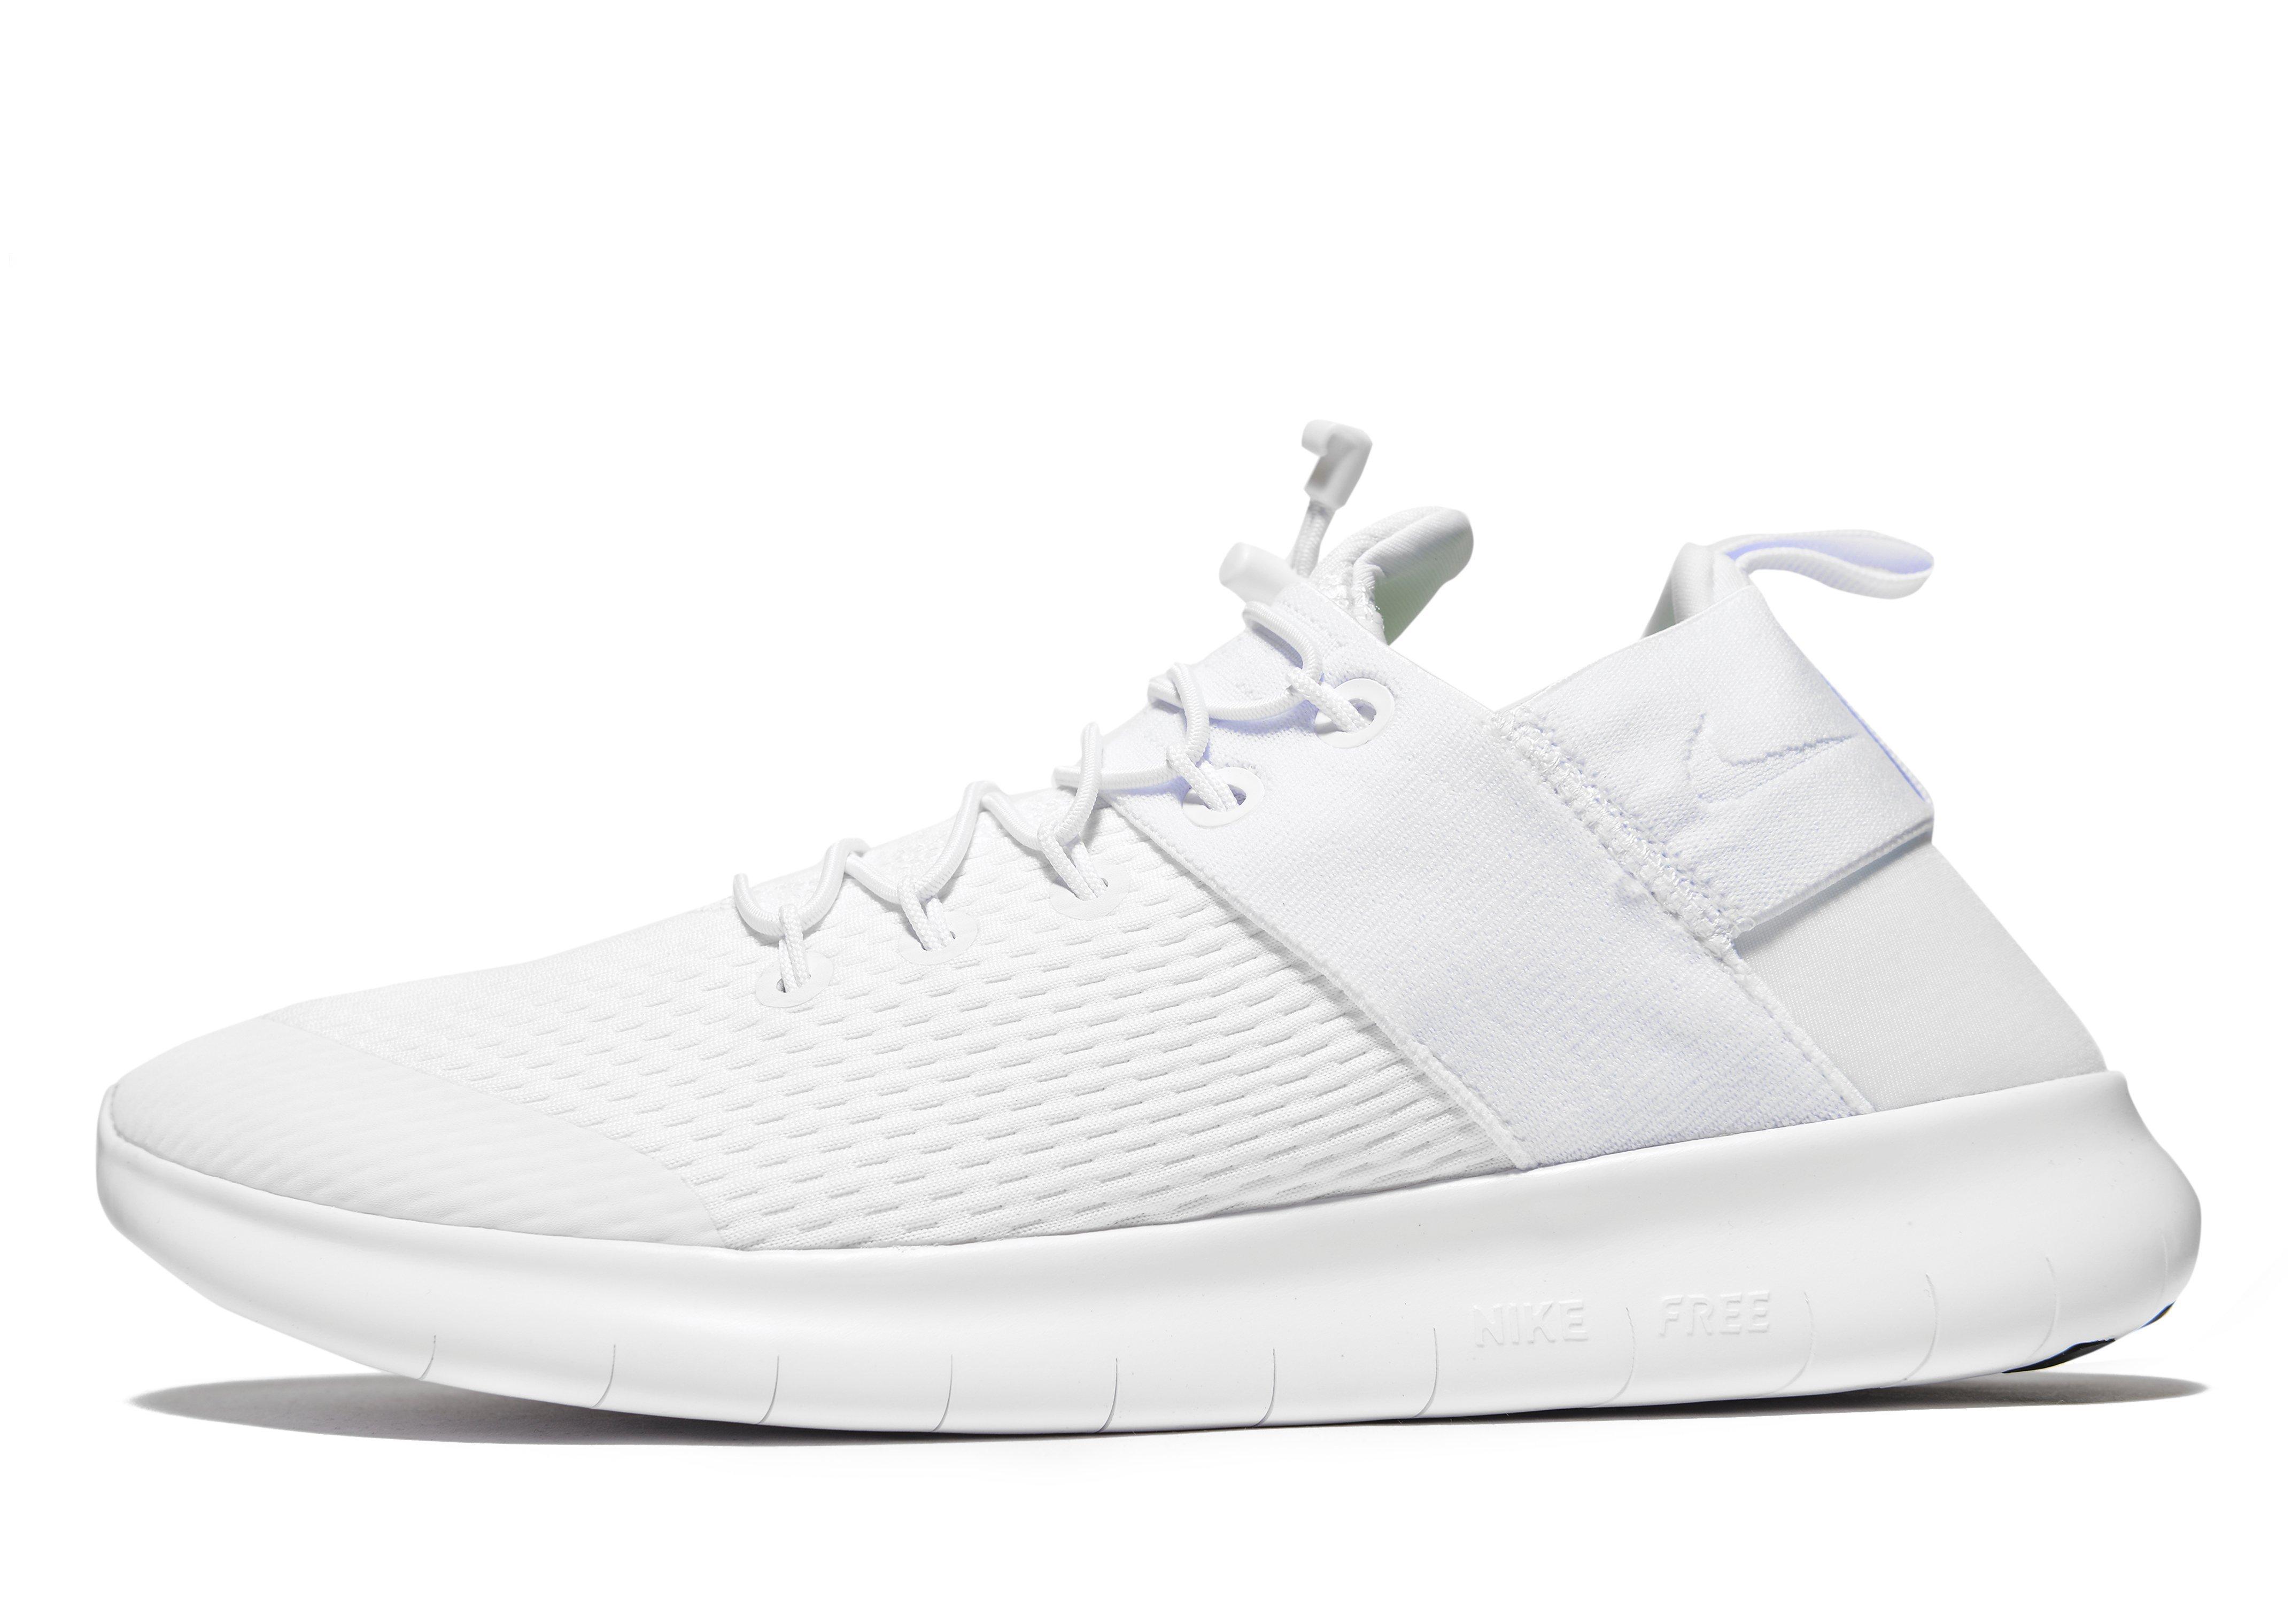 Lyst - Nike Free Run Commuter 2 in White for Men ac88c4620